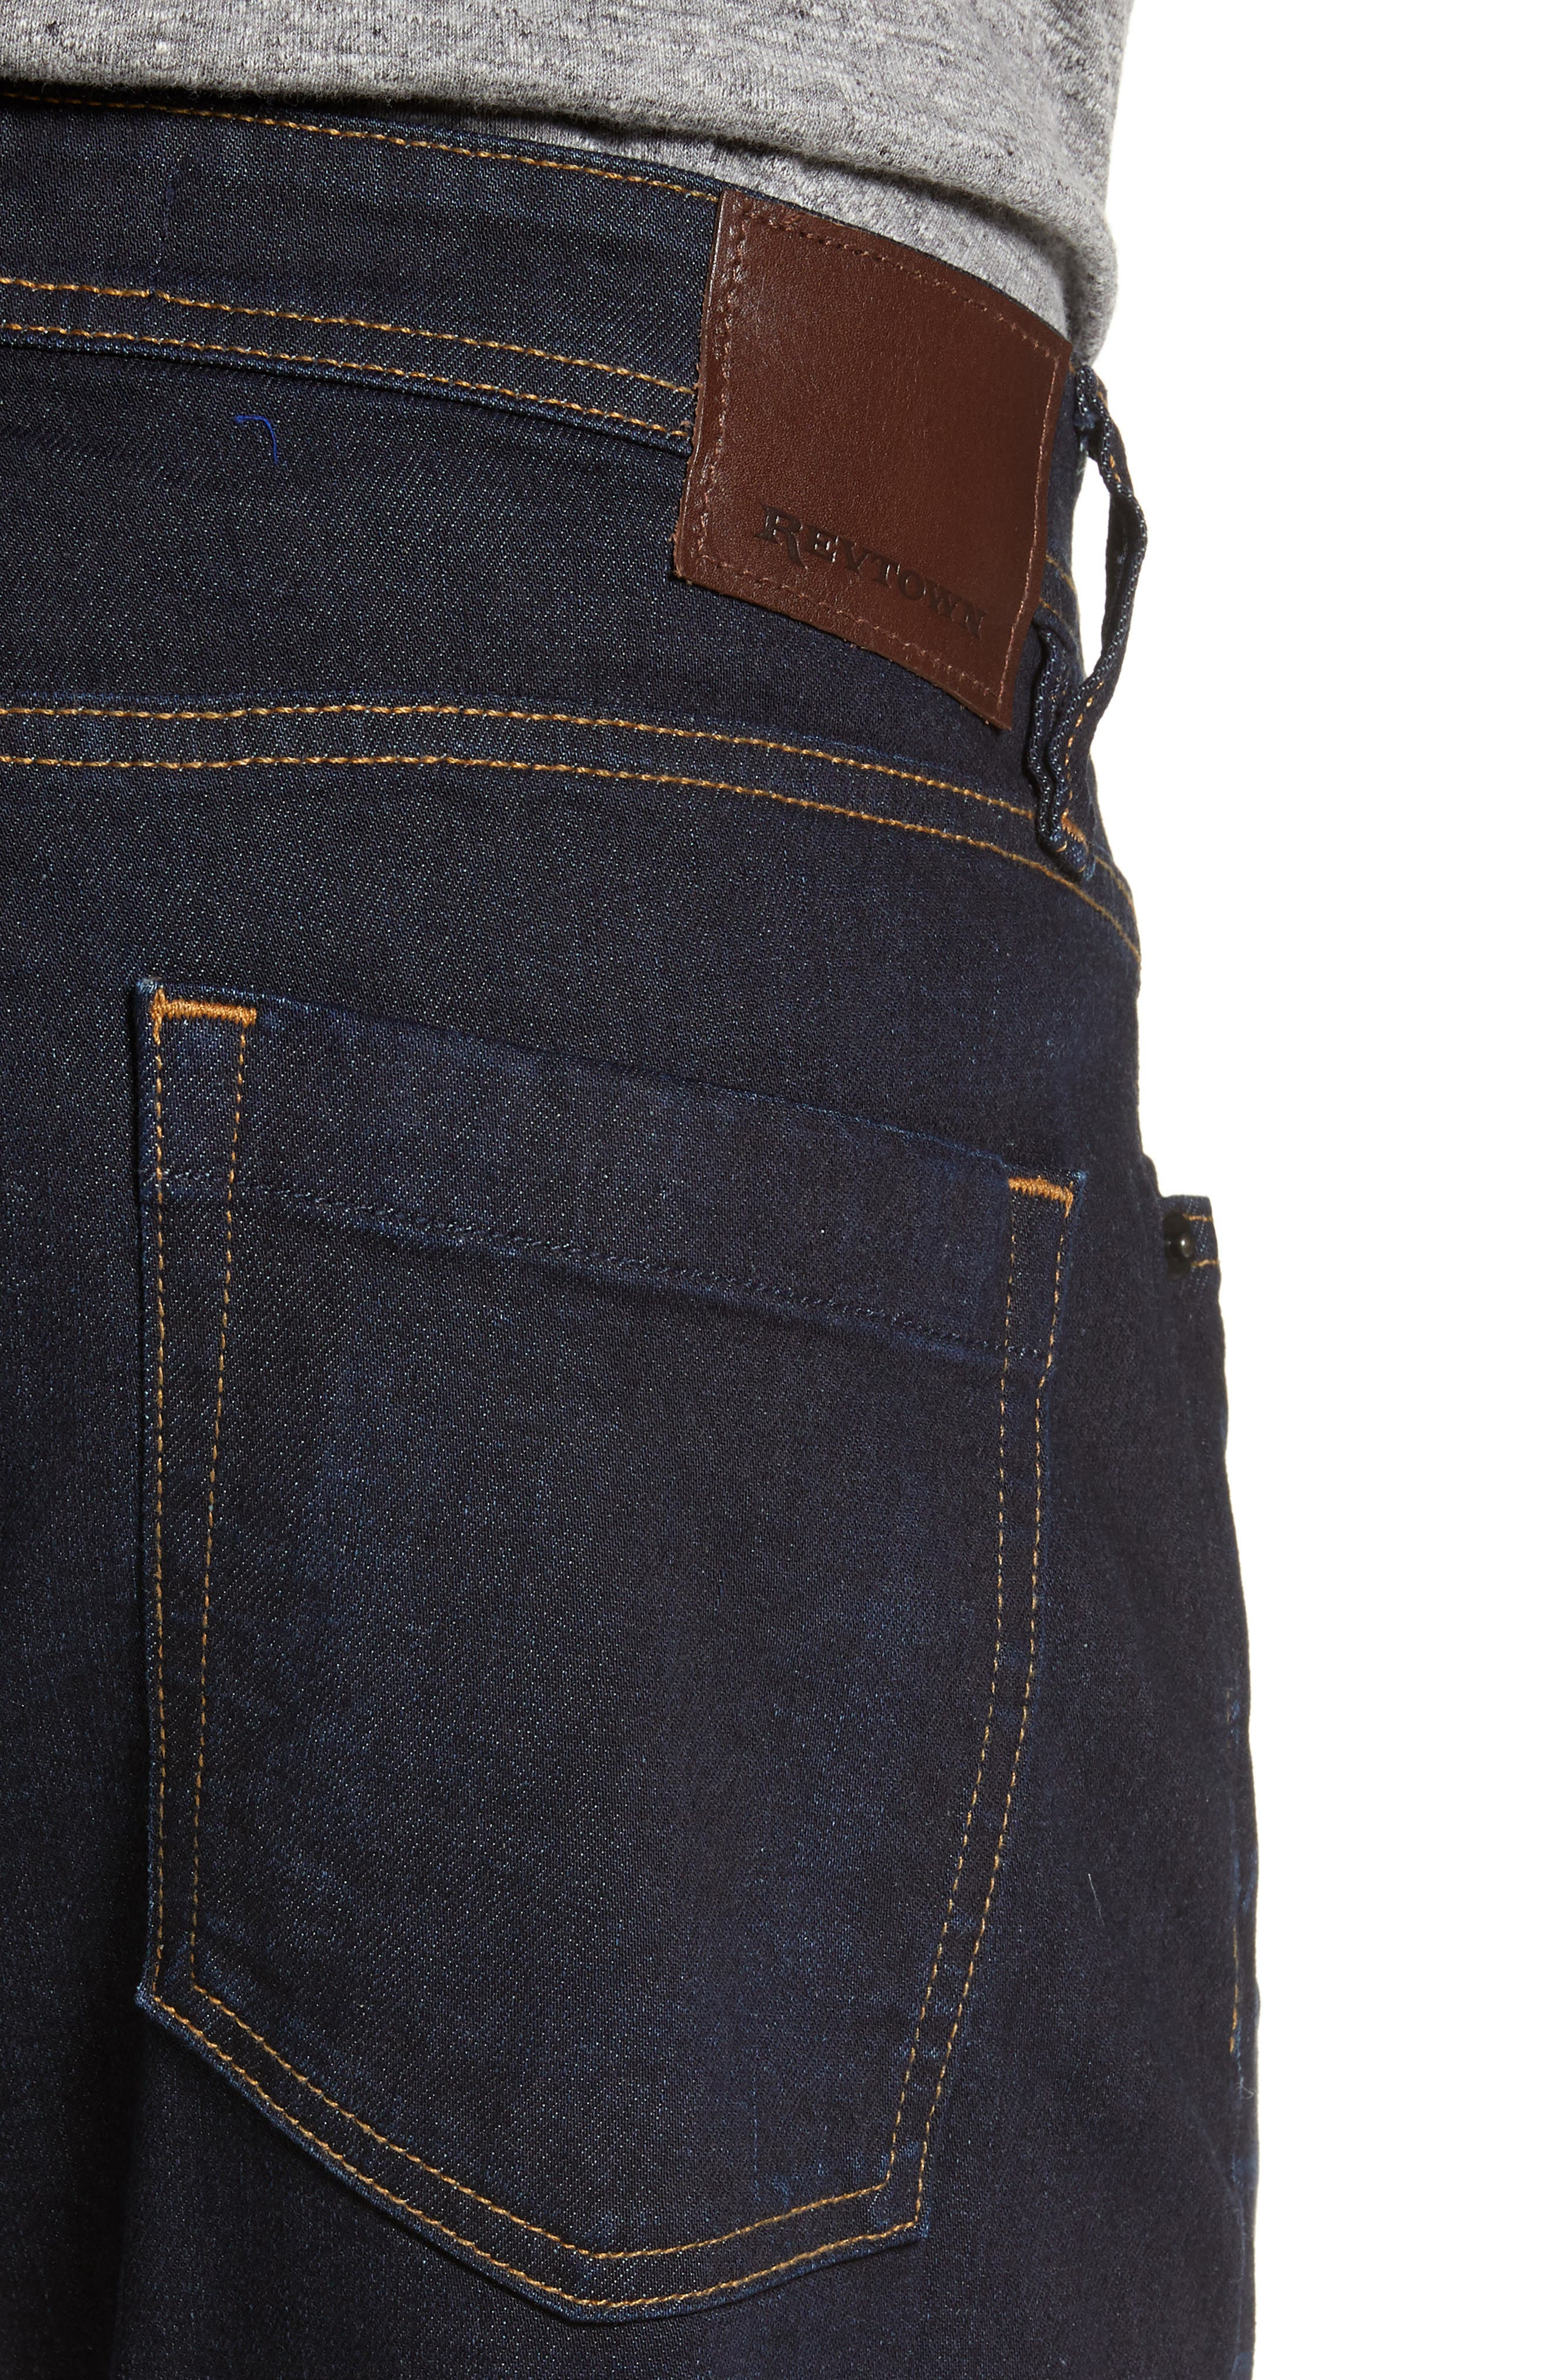 Sharp Slim Fit Jeans,                             Alternate thumbnail 4, color,                             DARK INDIGO